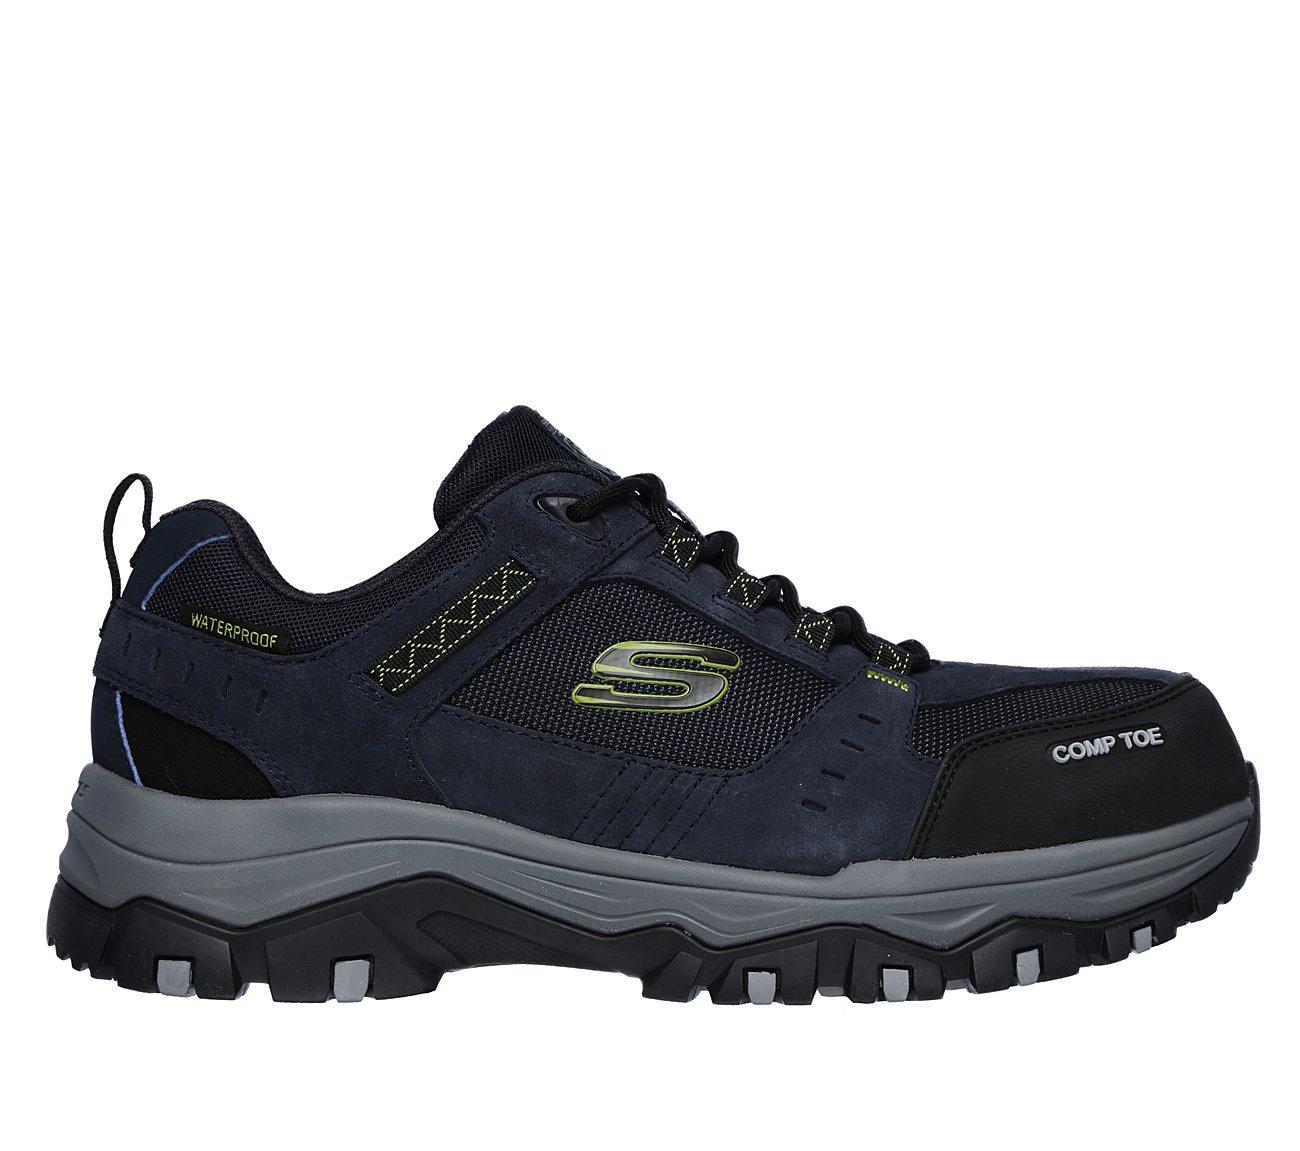 Greetah Comp Toe SKECHERS Work Shoes